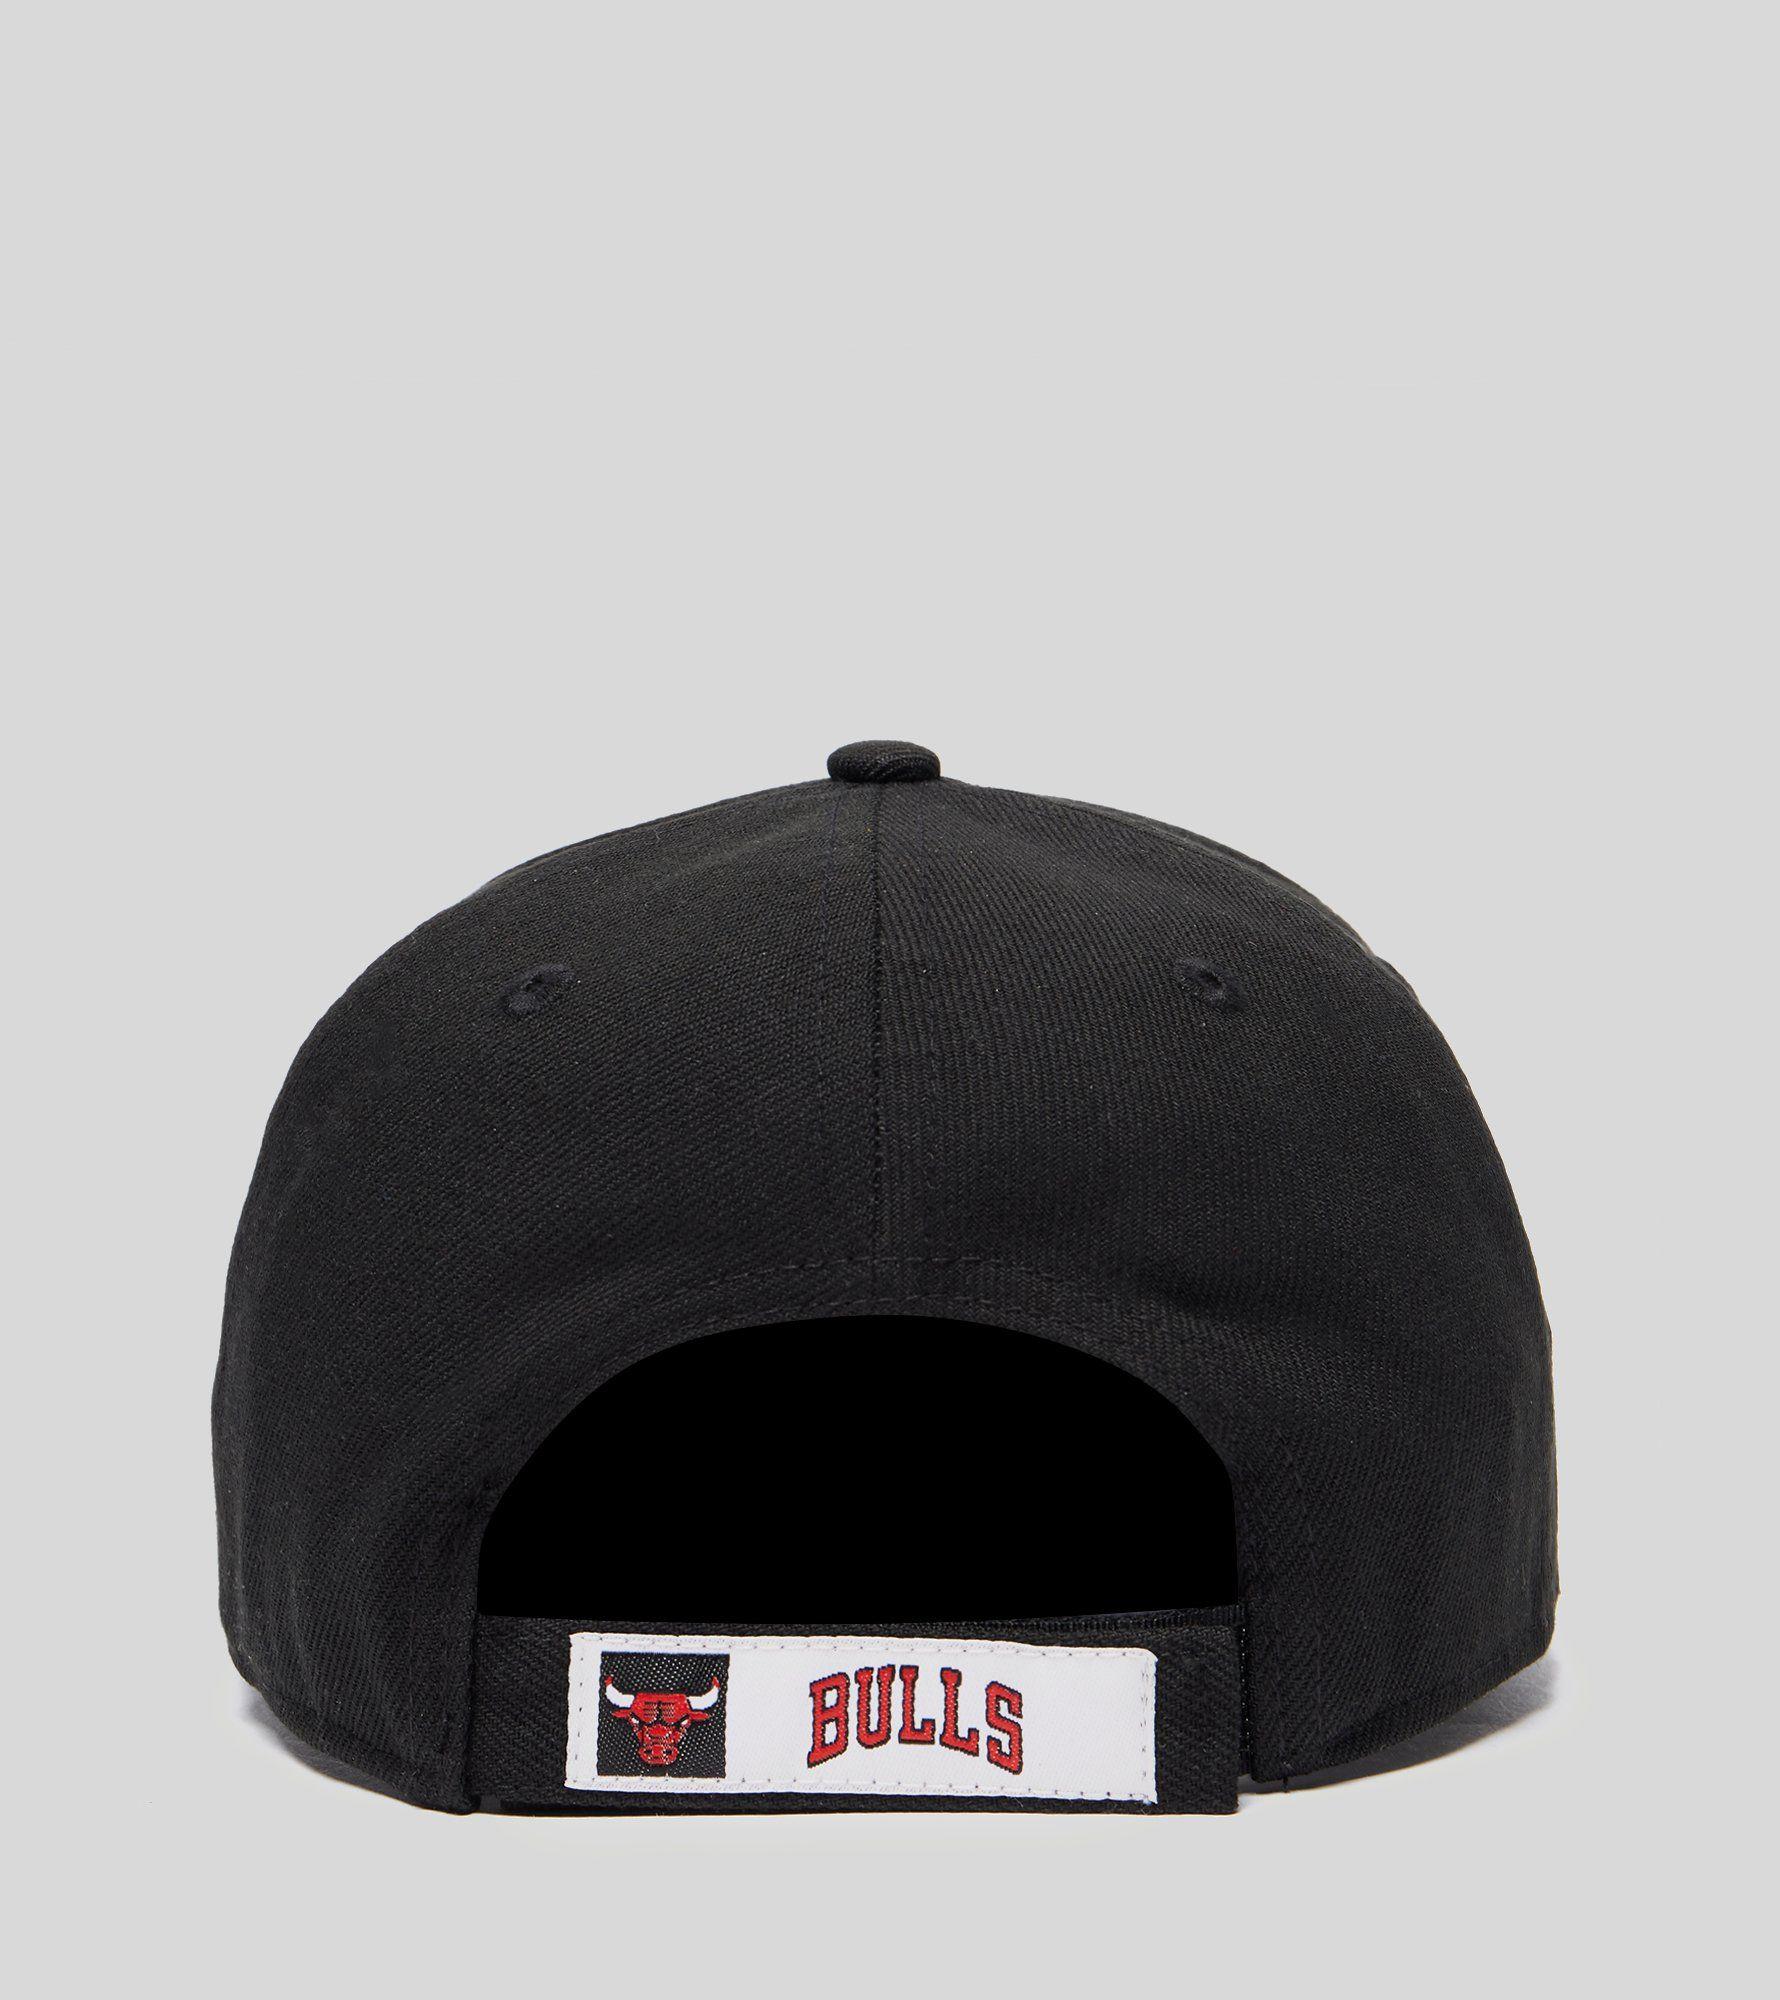 New Era 9FORTY Chicago Bulls Cap